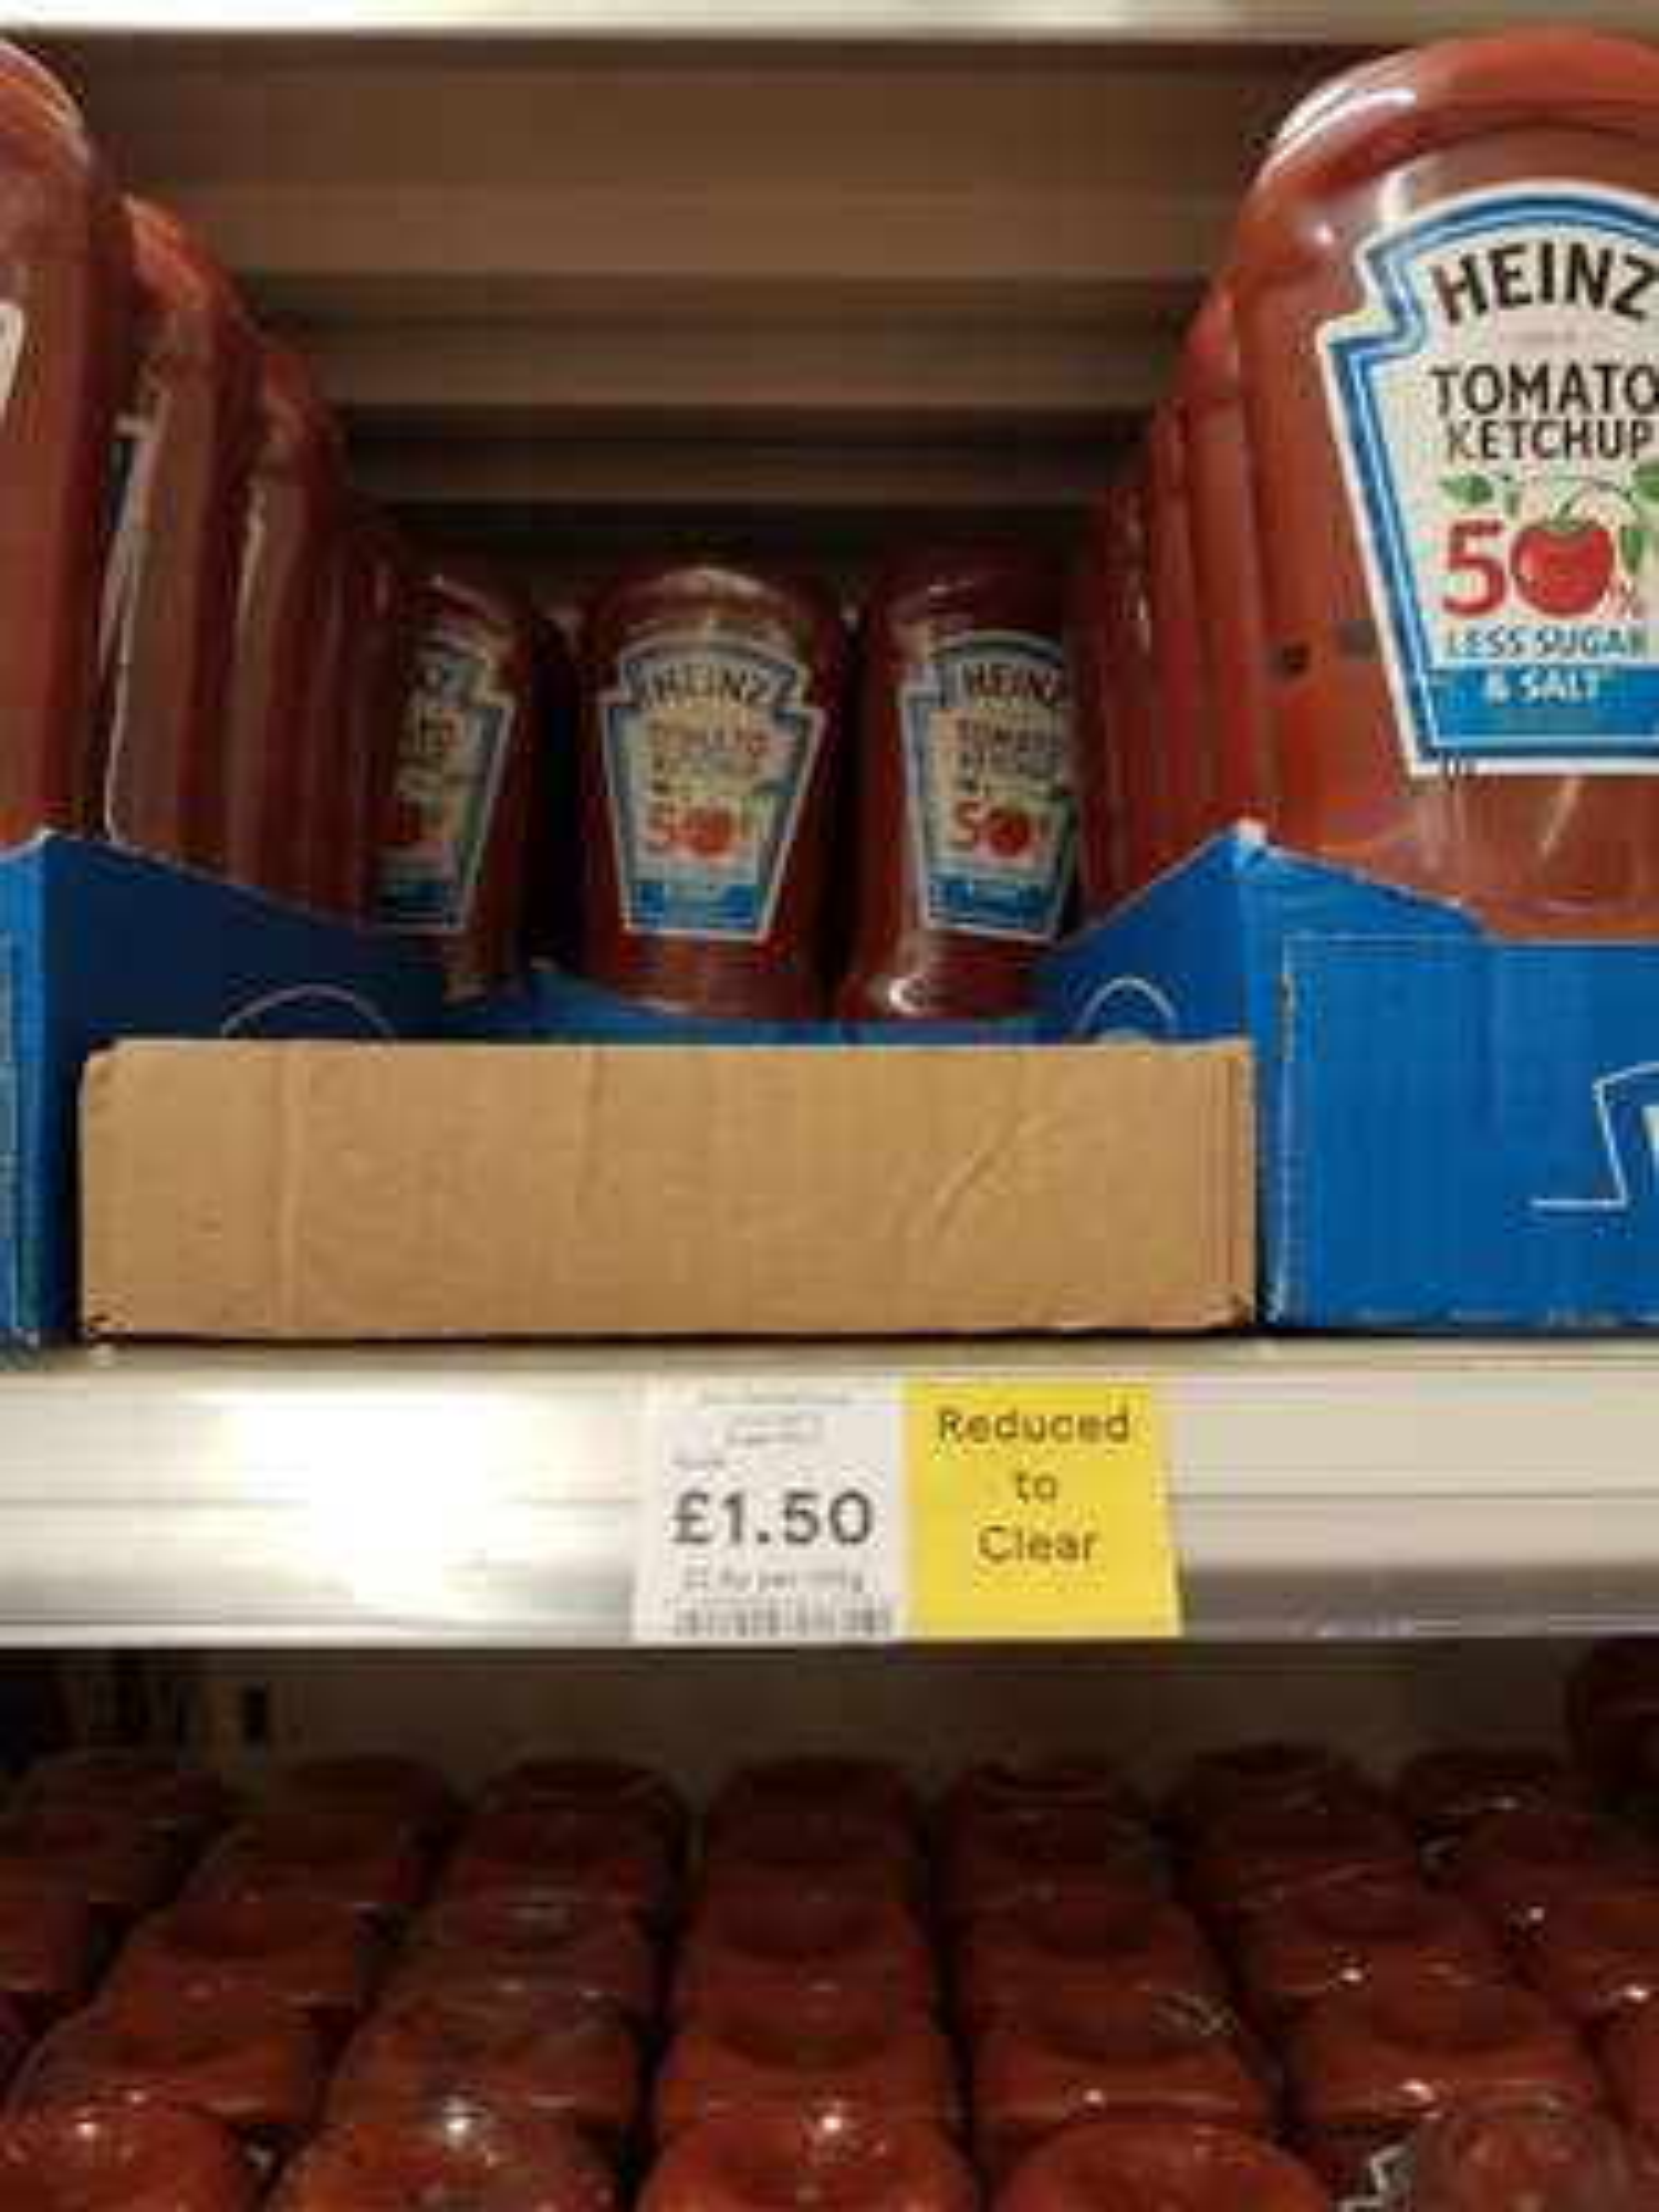 Tesco Heinz Tom Ketchup Less Salt And Sugar 665G £1.50